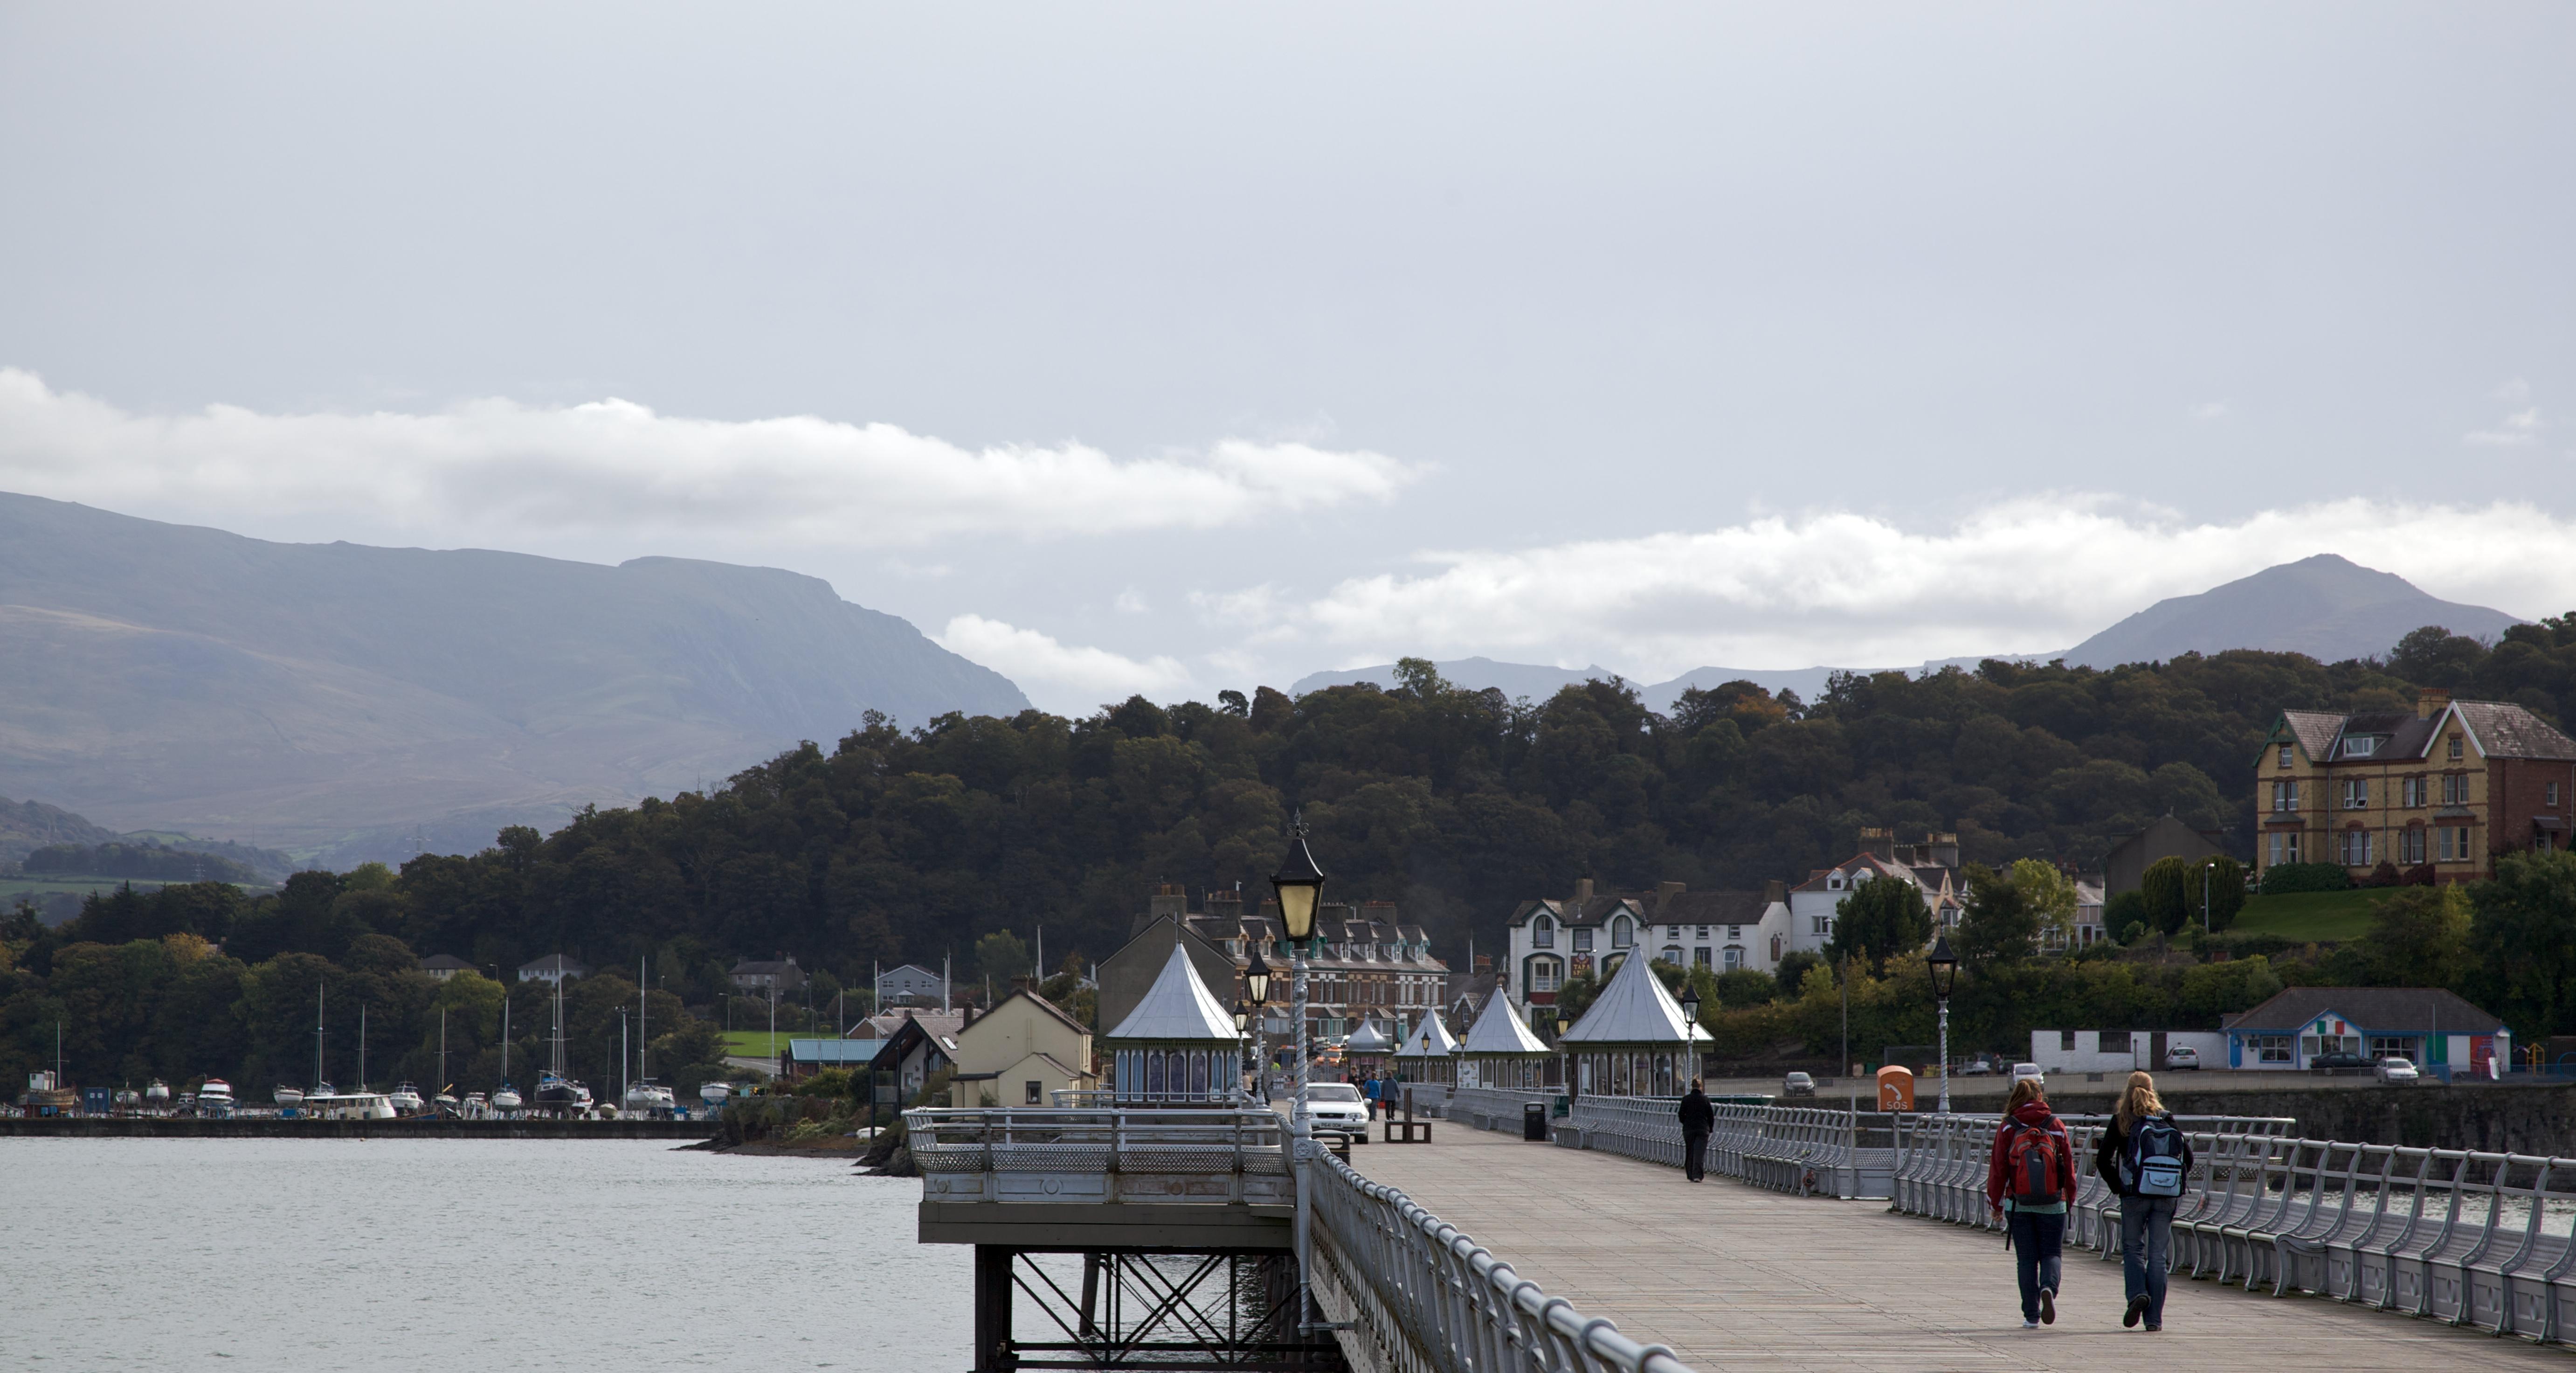 Bangor's Garth Pier